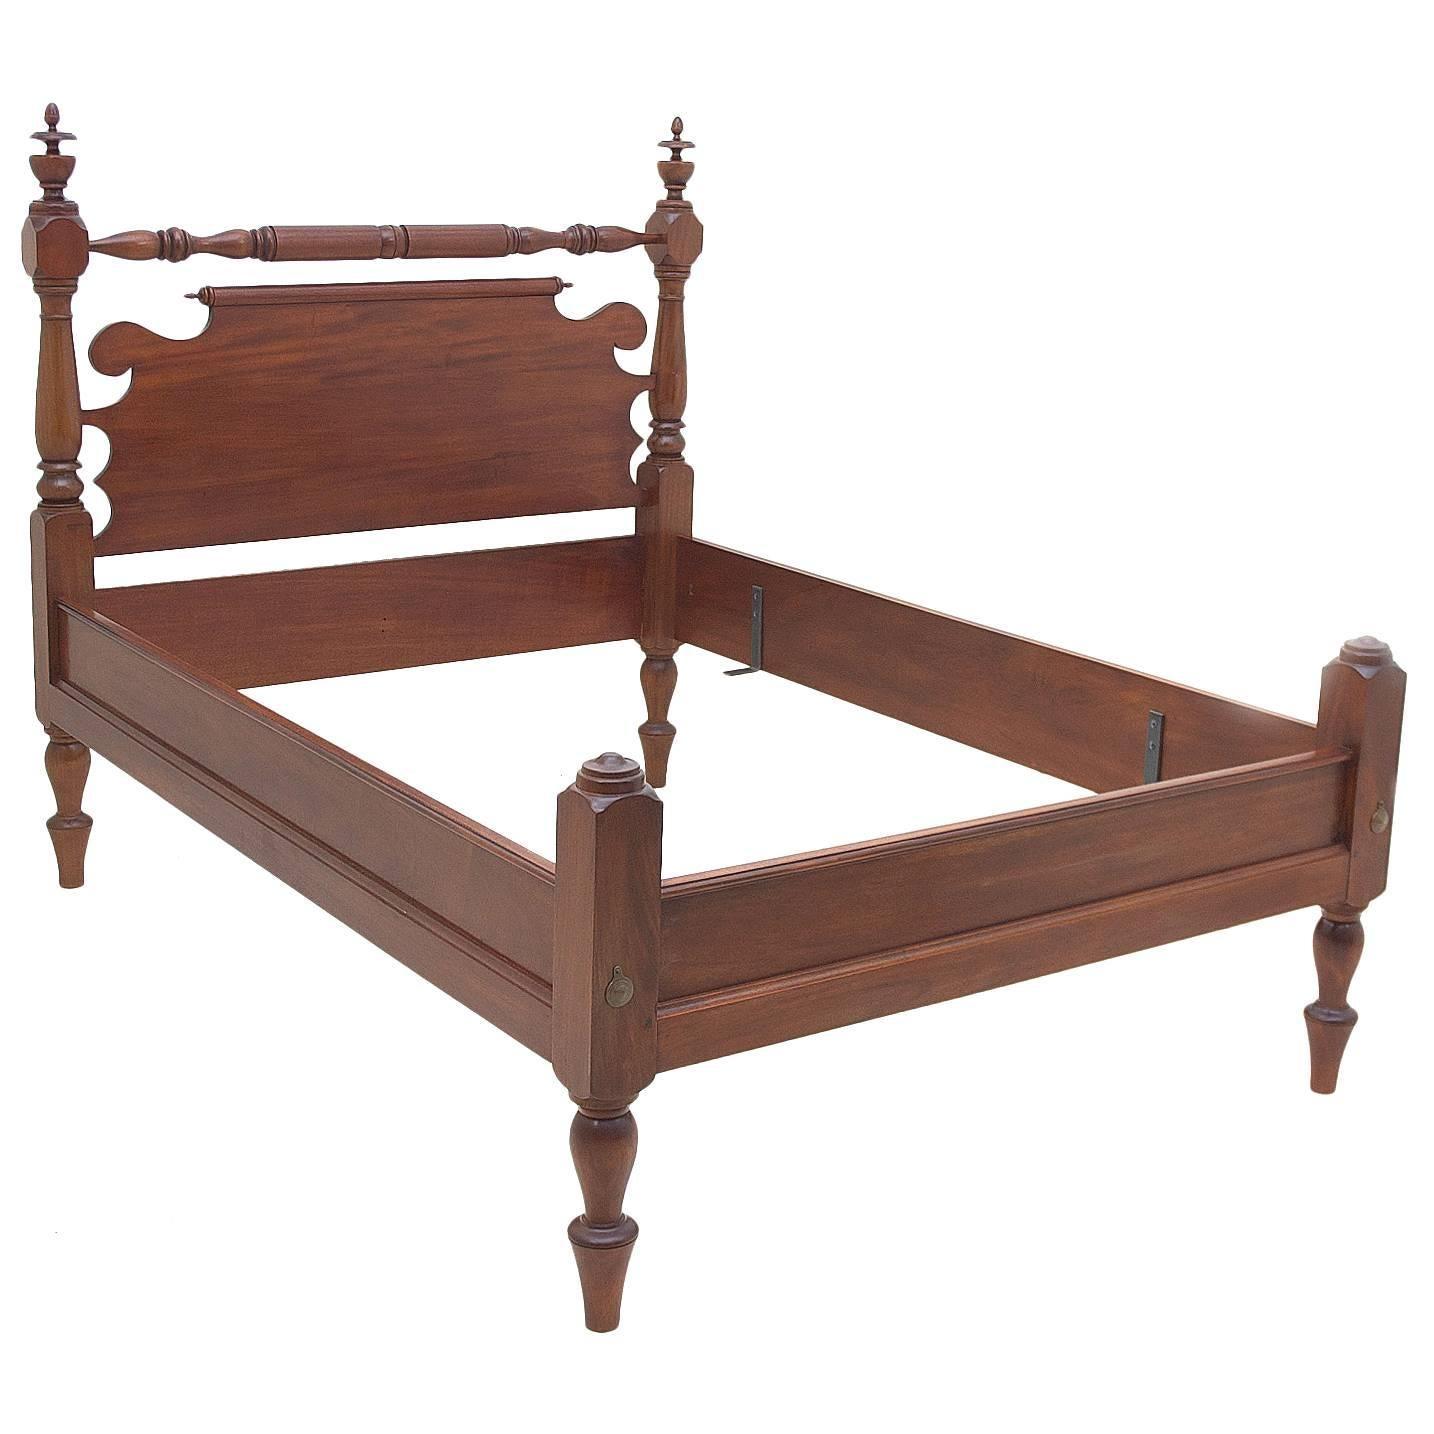 Bonnin Ashley Custom Made Full-Size Cannonball Bed in Poplar